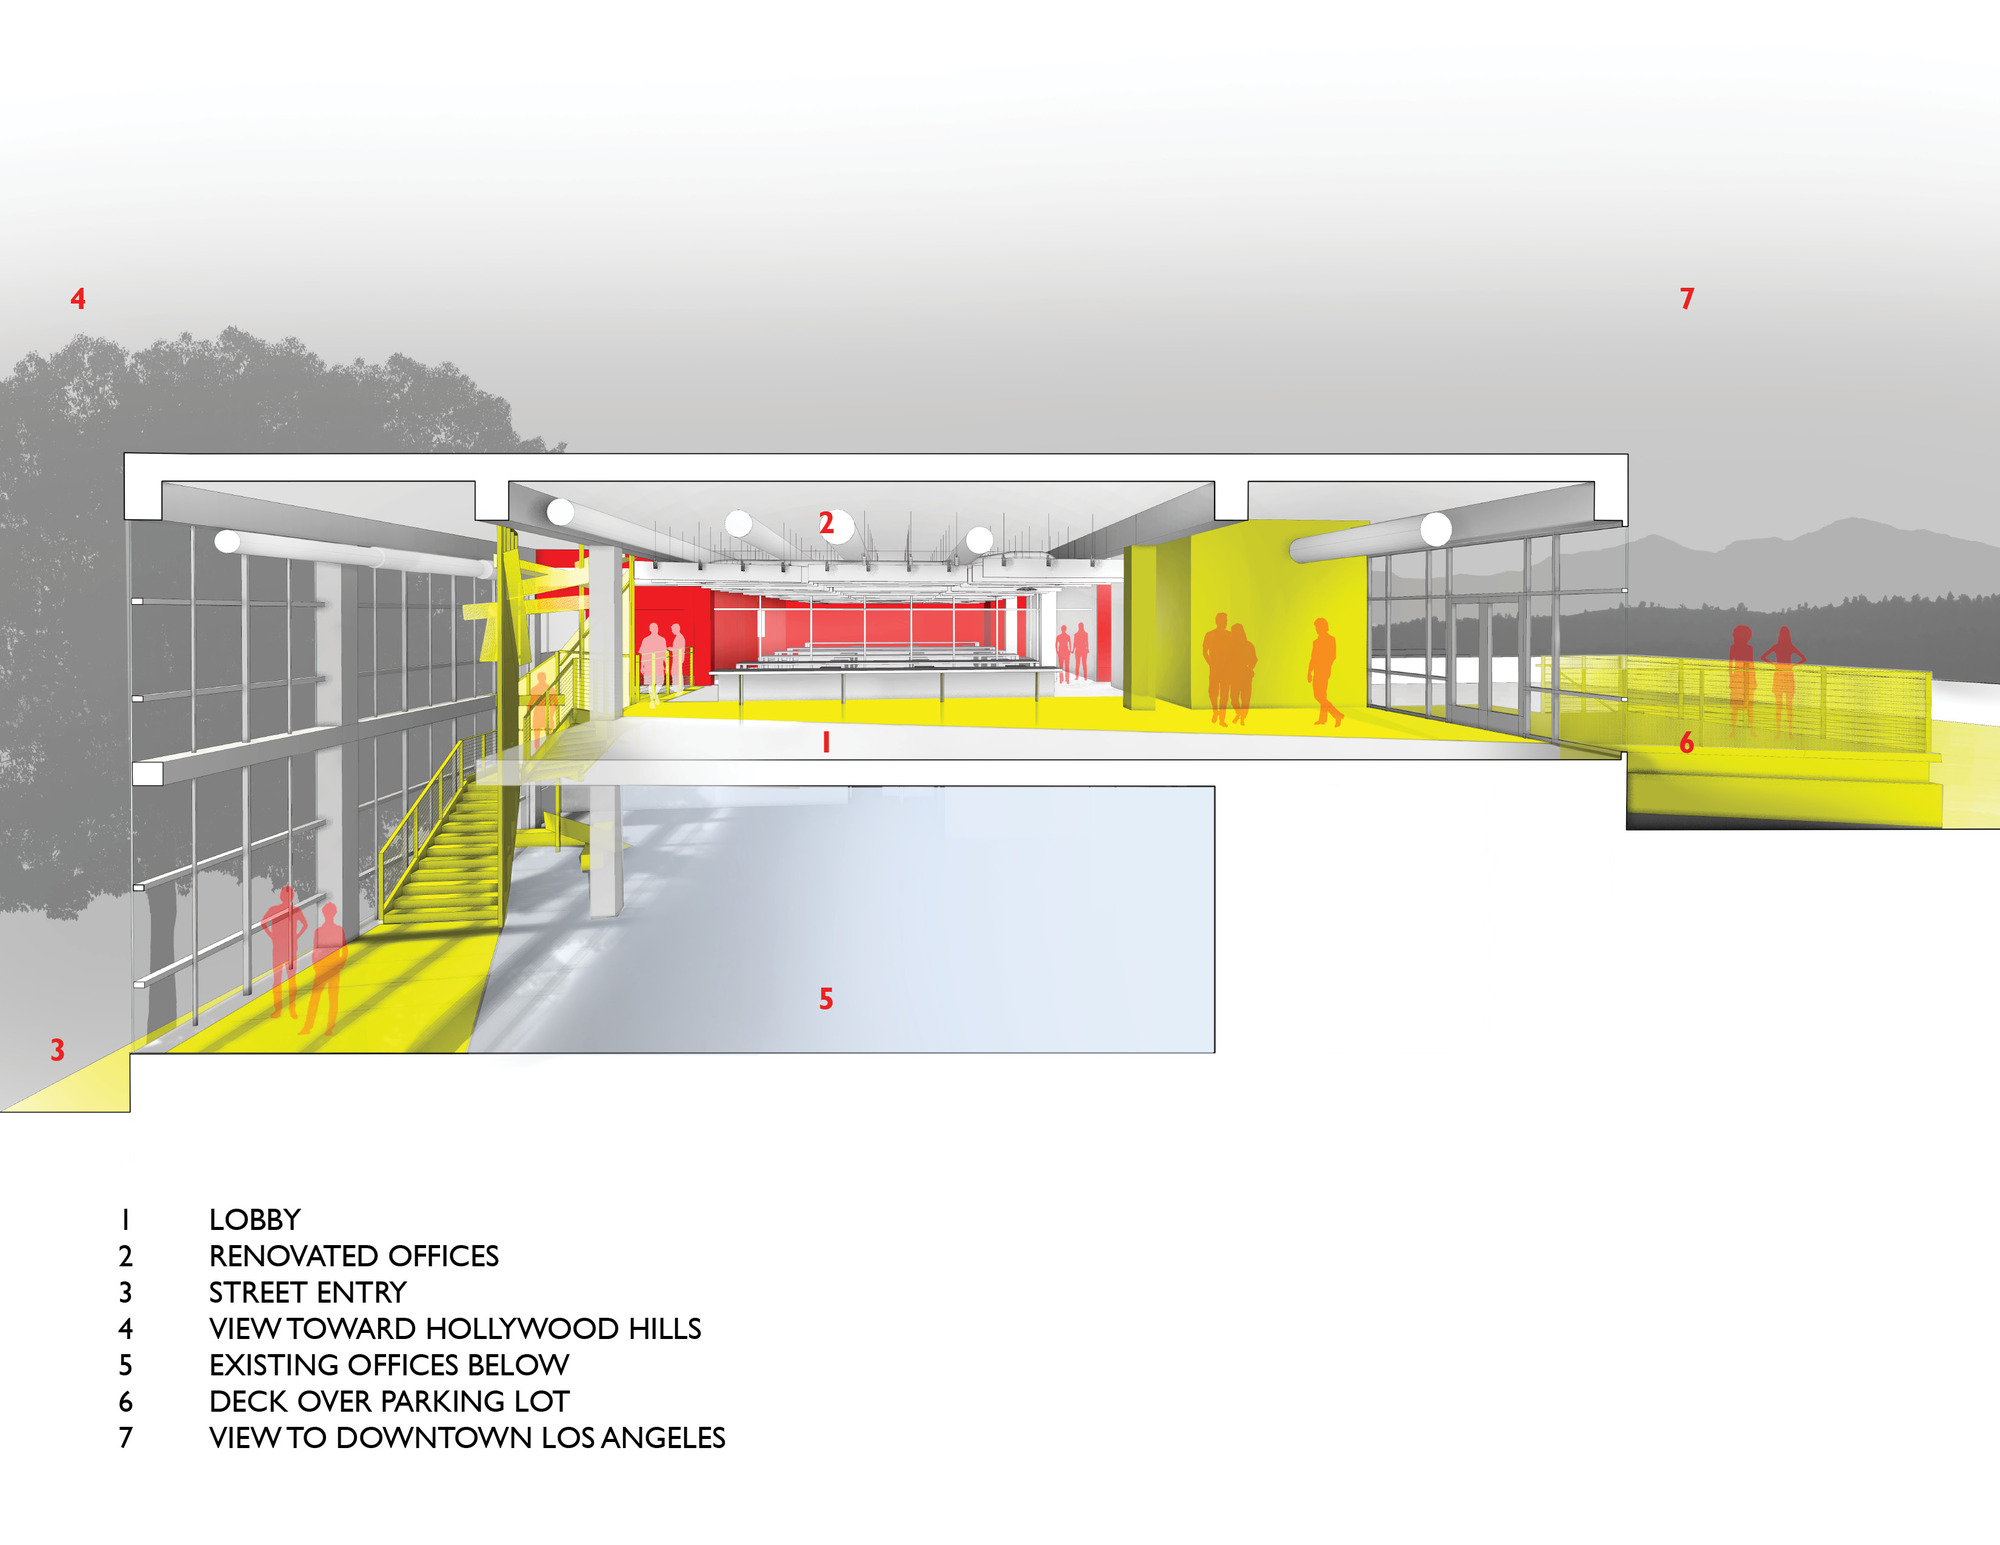 Lehrer architects office design Unite Here Agrandar Imagen Ver Tamaño Original Kcrwcom Galería De Oficina Unite Here Health En Los Angeles Lehrer